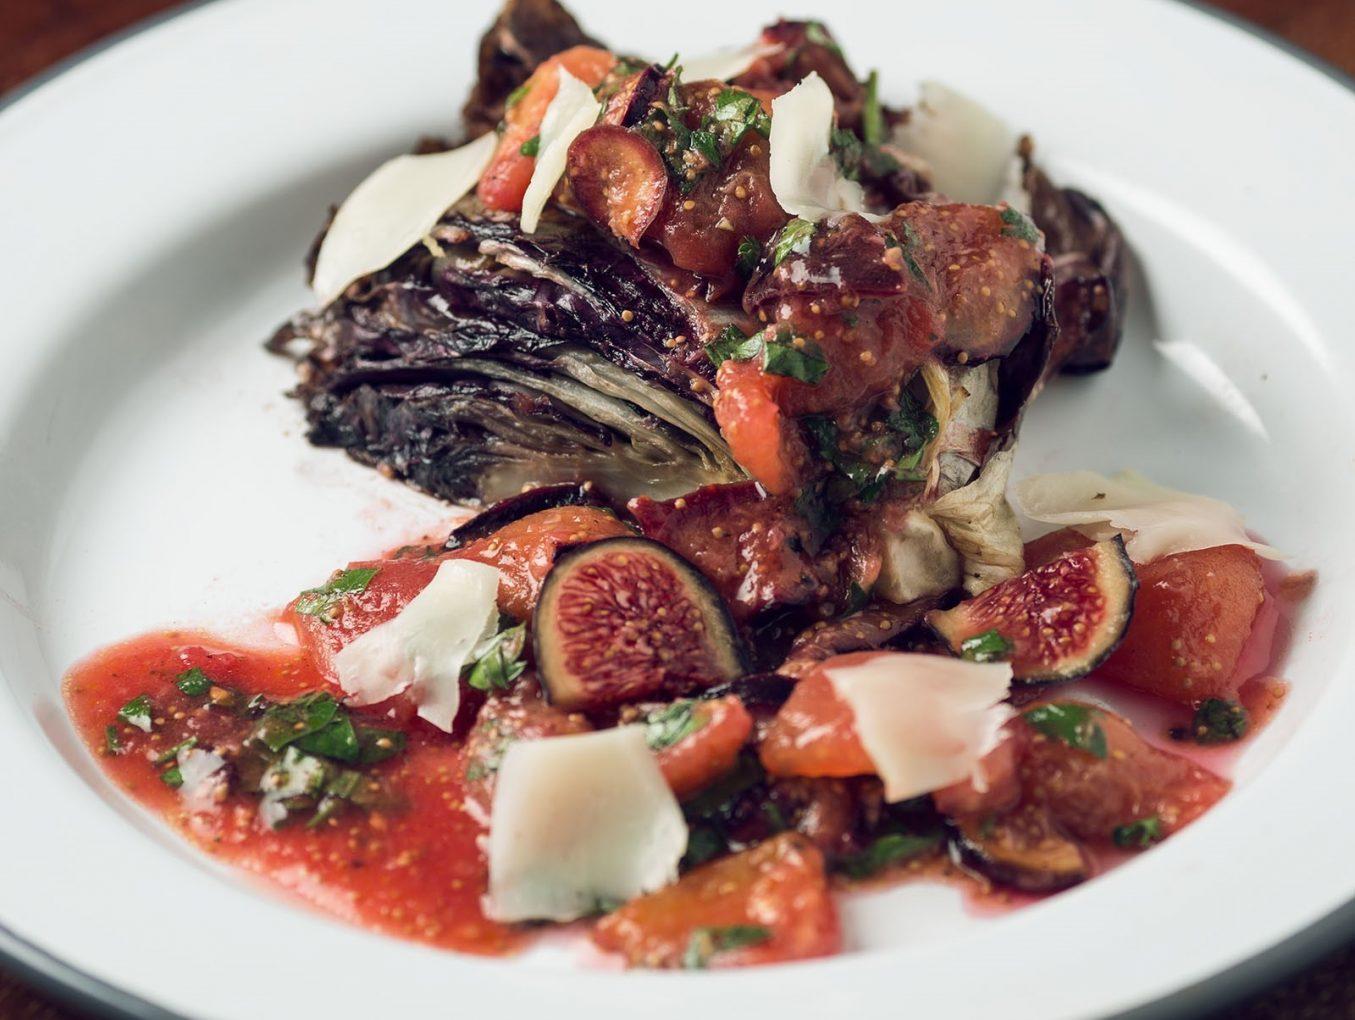 Radicchio mit Tomaten-Feigen-Salat